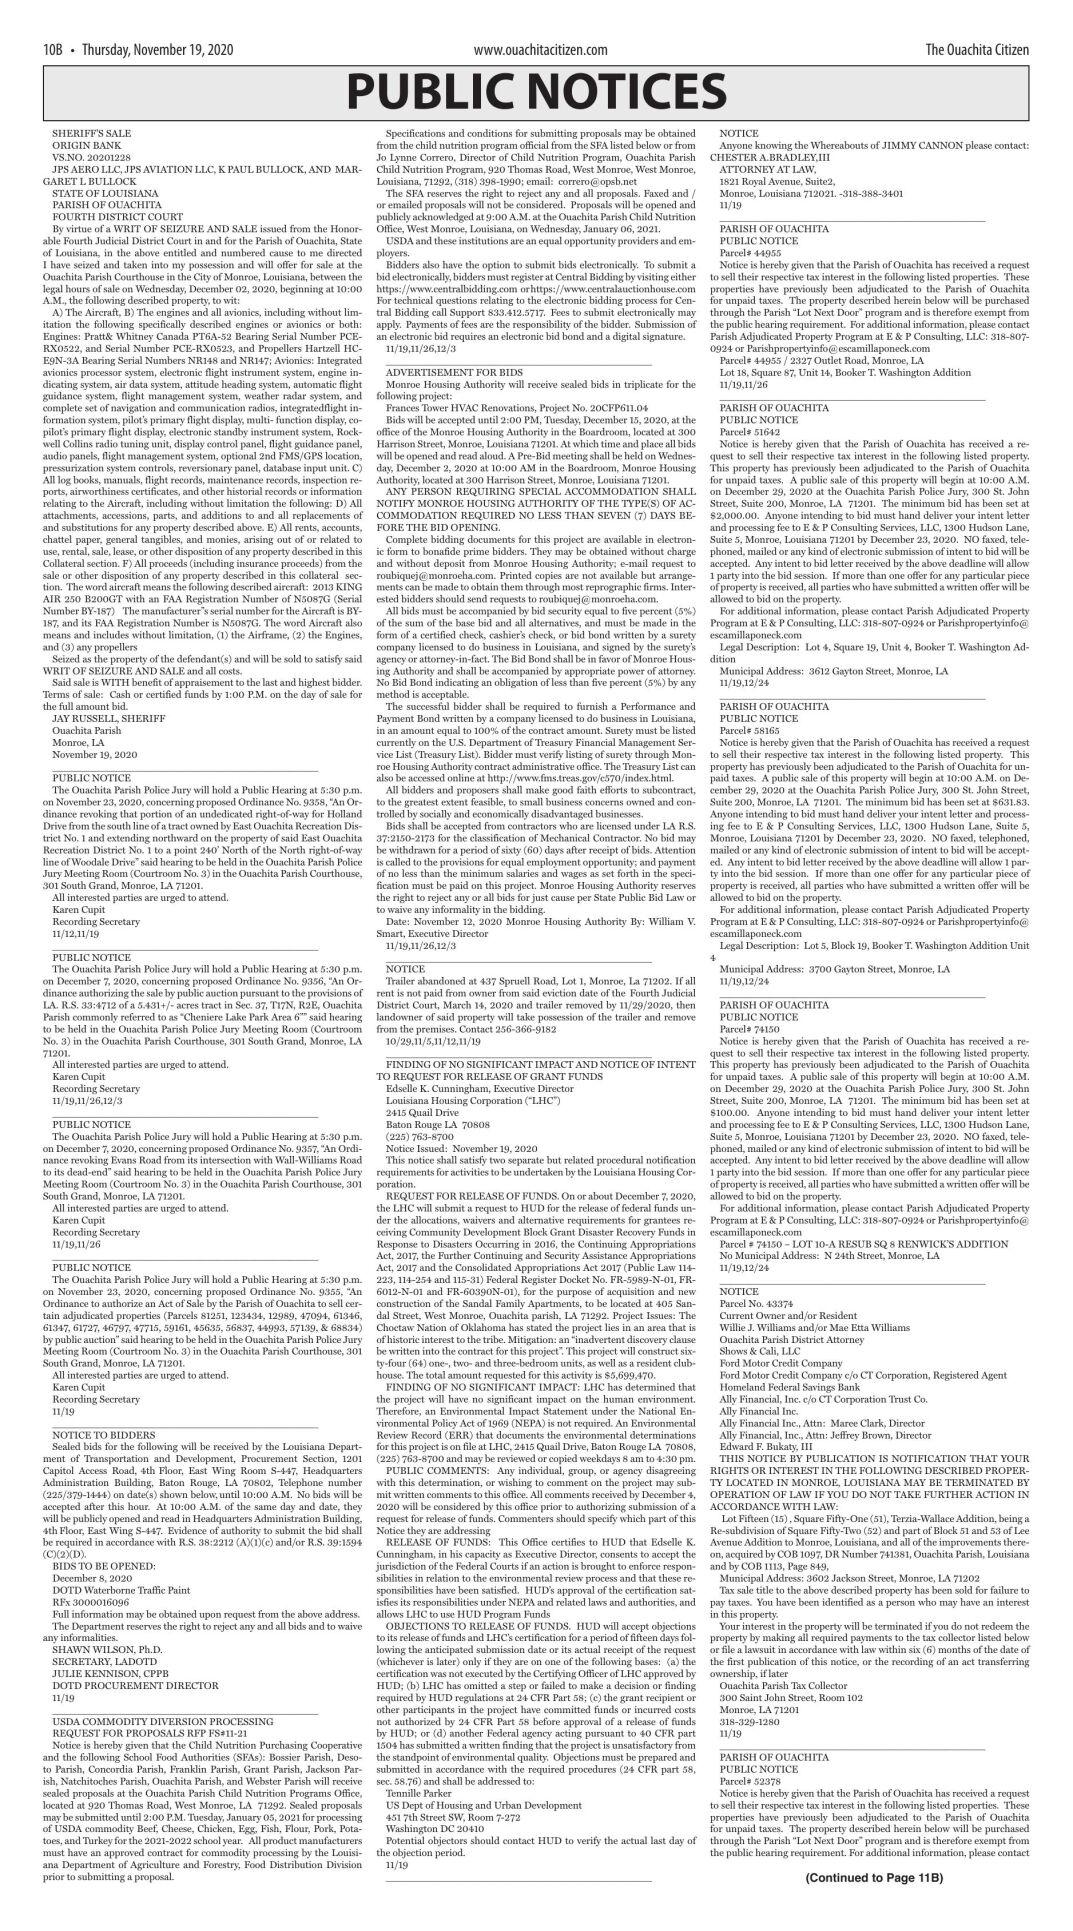 Nov. 19, 2020 Public Notices, click to download pages